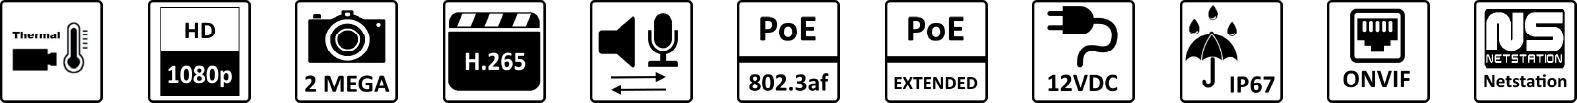 lunaIP_KT-5200-HTM_Icon